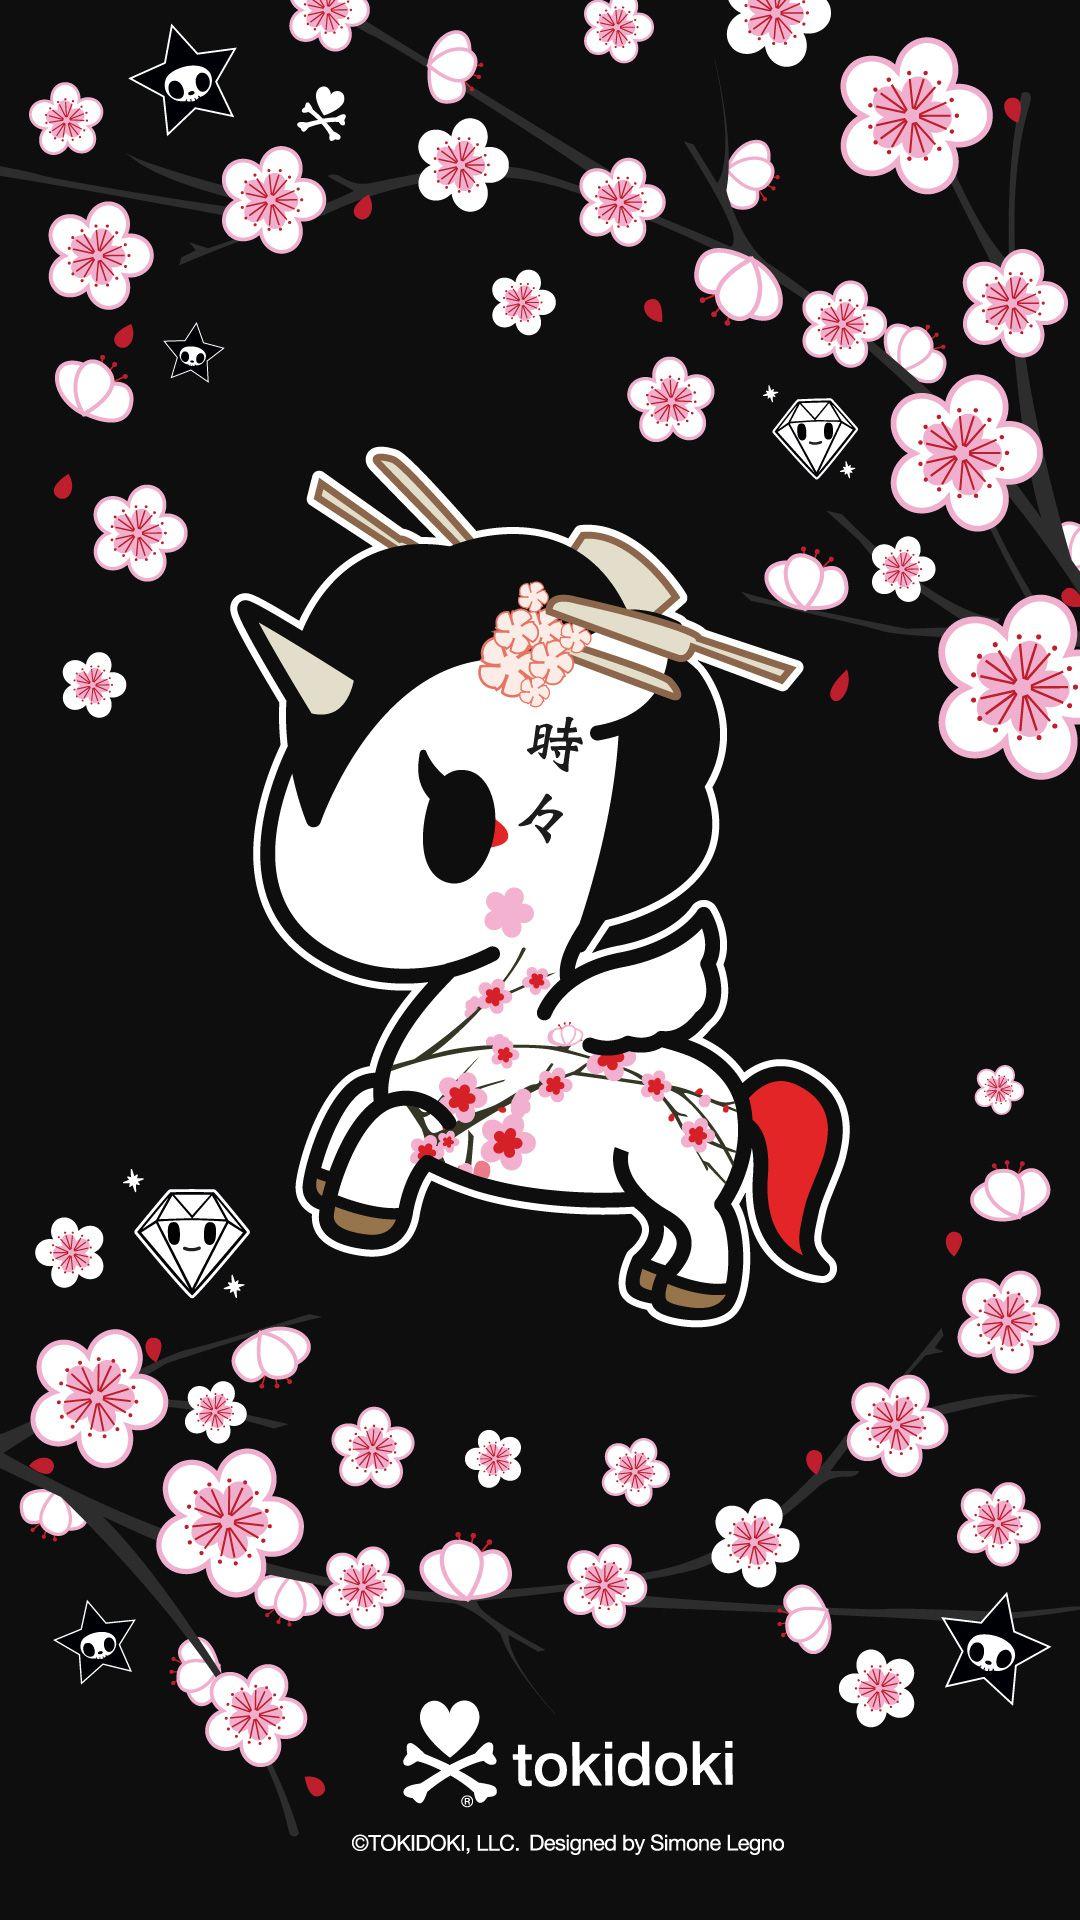 Tokidoki Unicorno Sakura Black Tokidoki In 2019 Kawaii